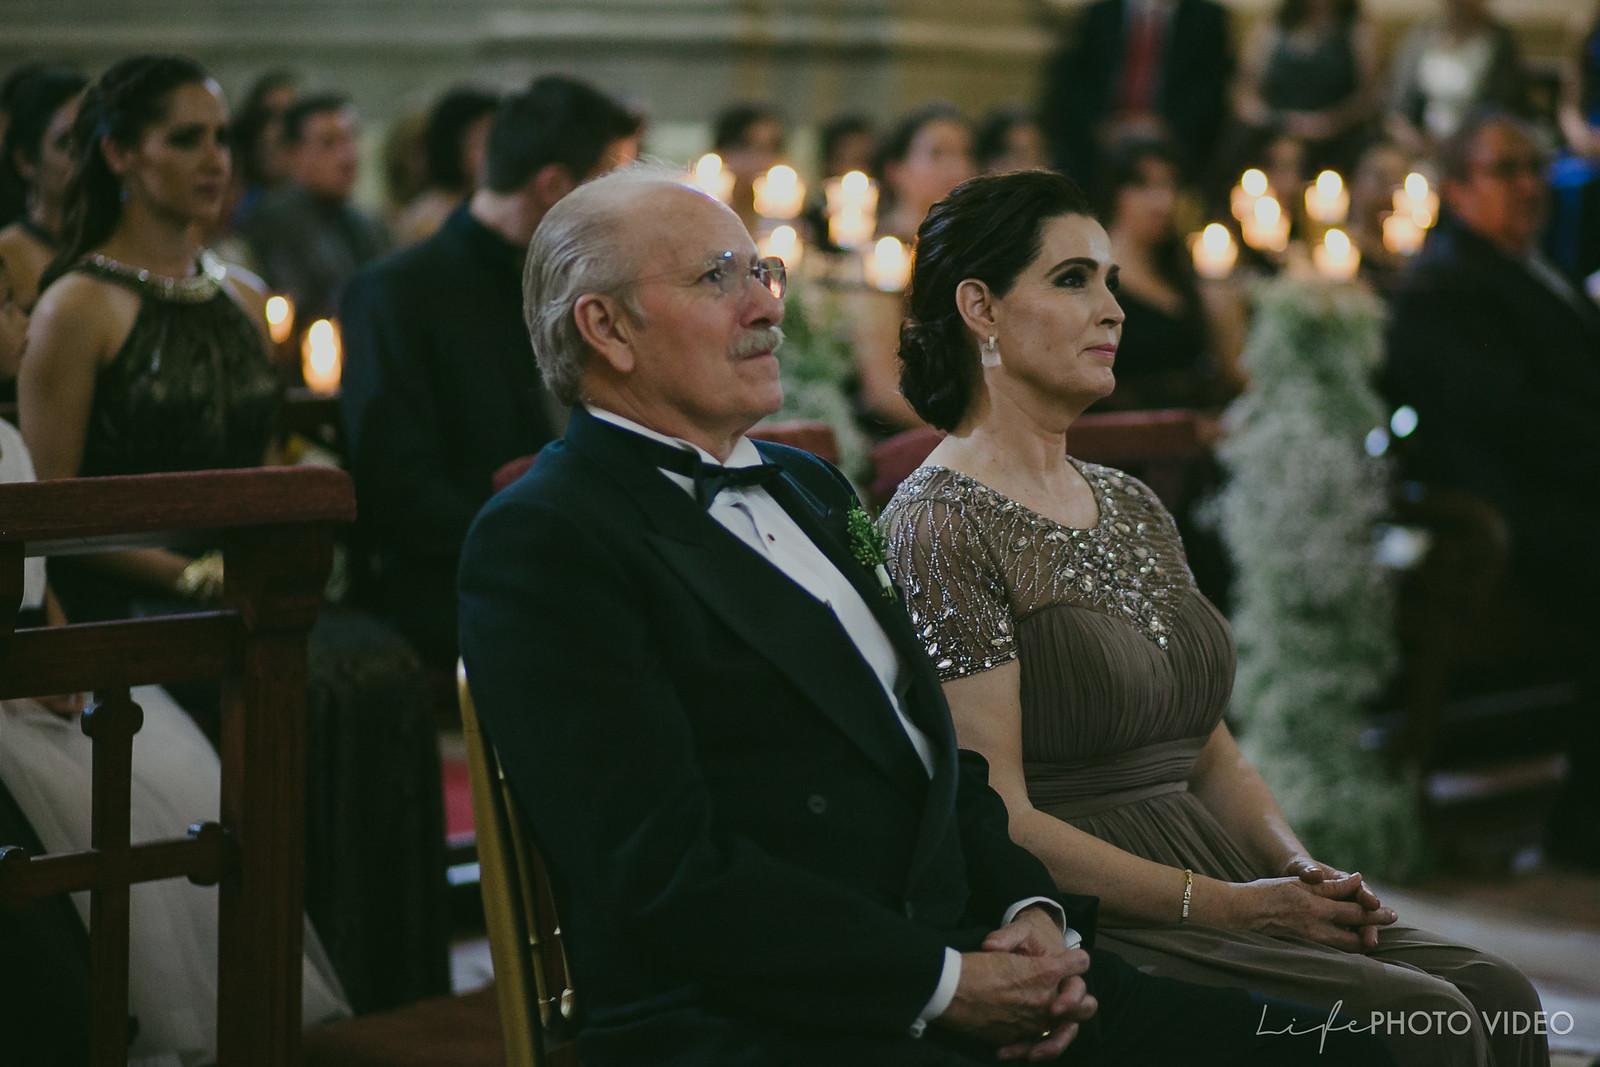 LifePhotoVideo_Boda_Guanajuato_Wedding_0037